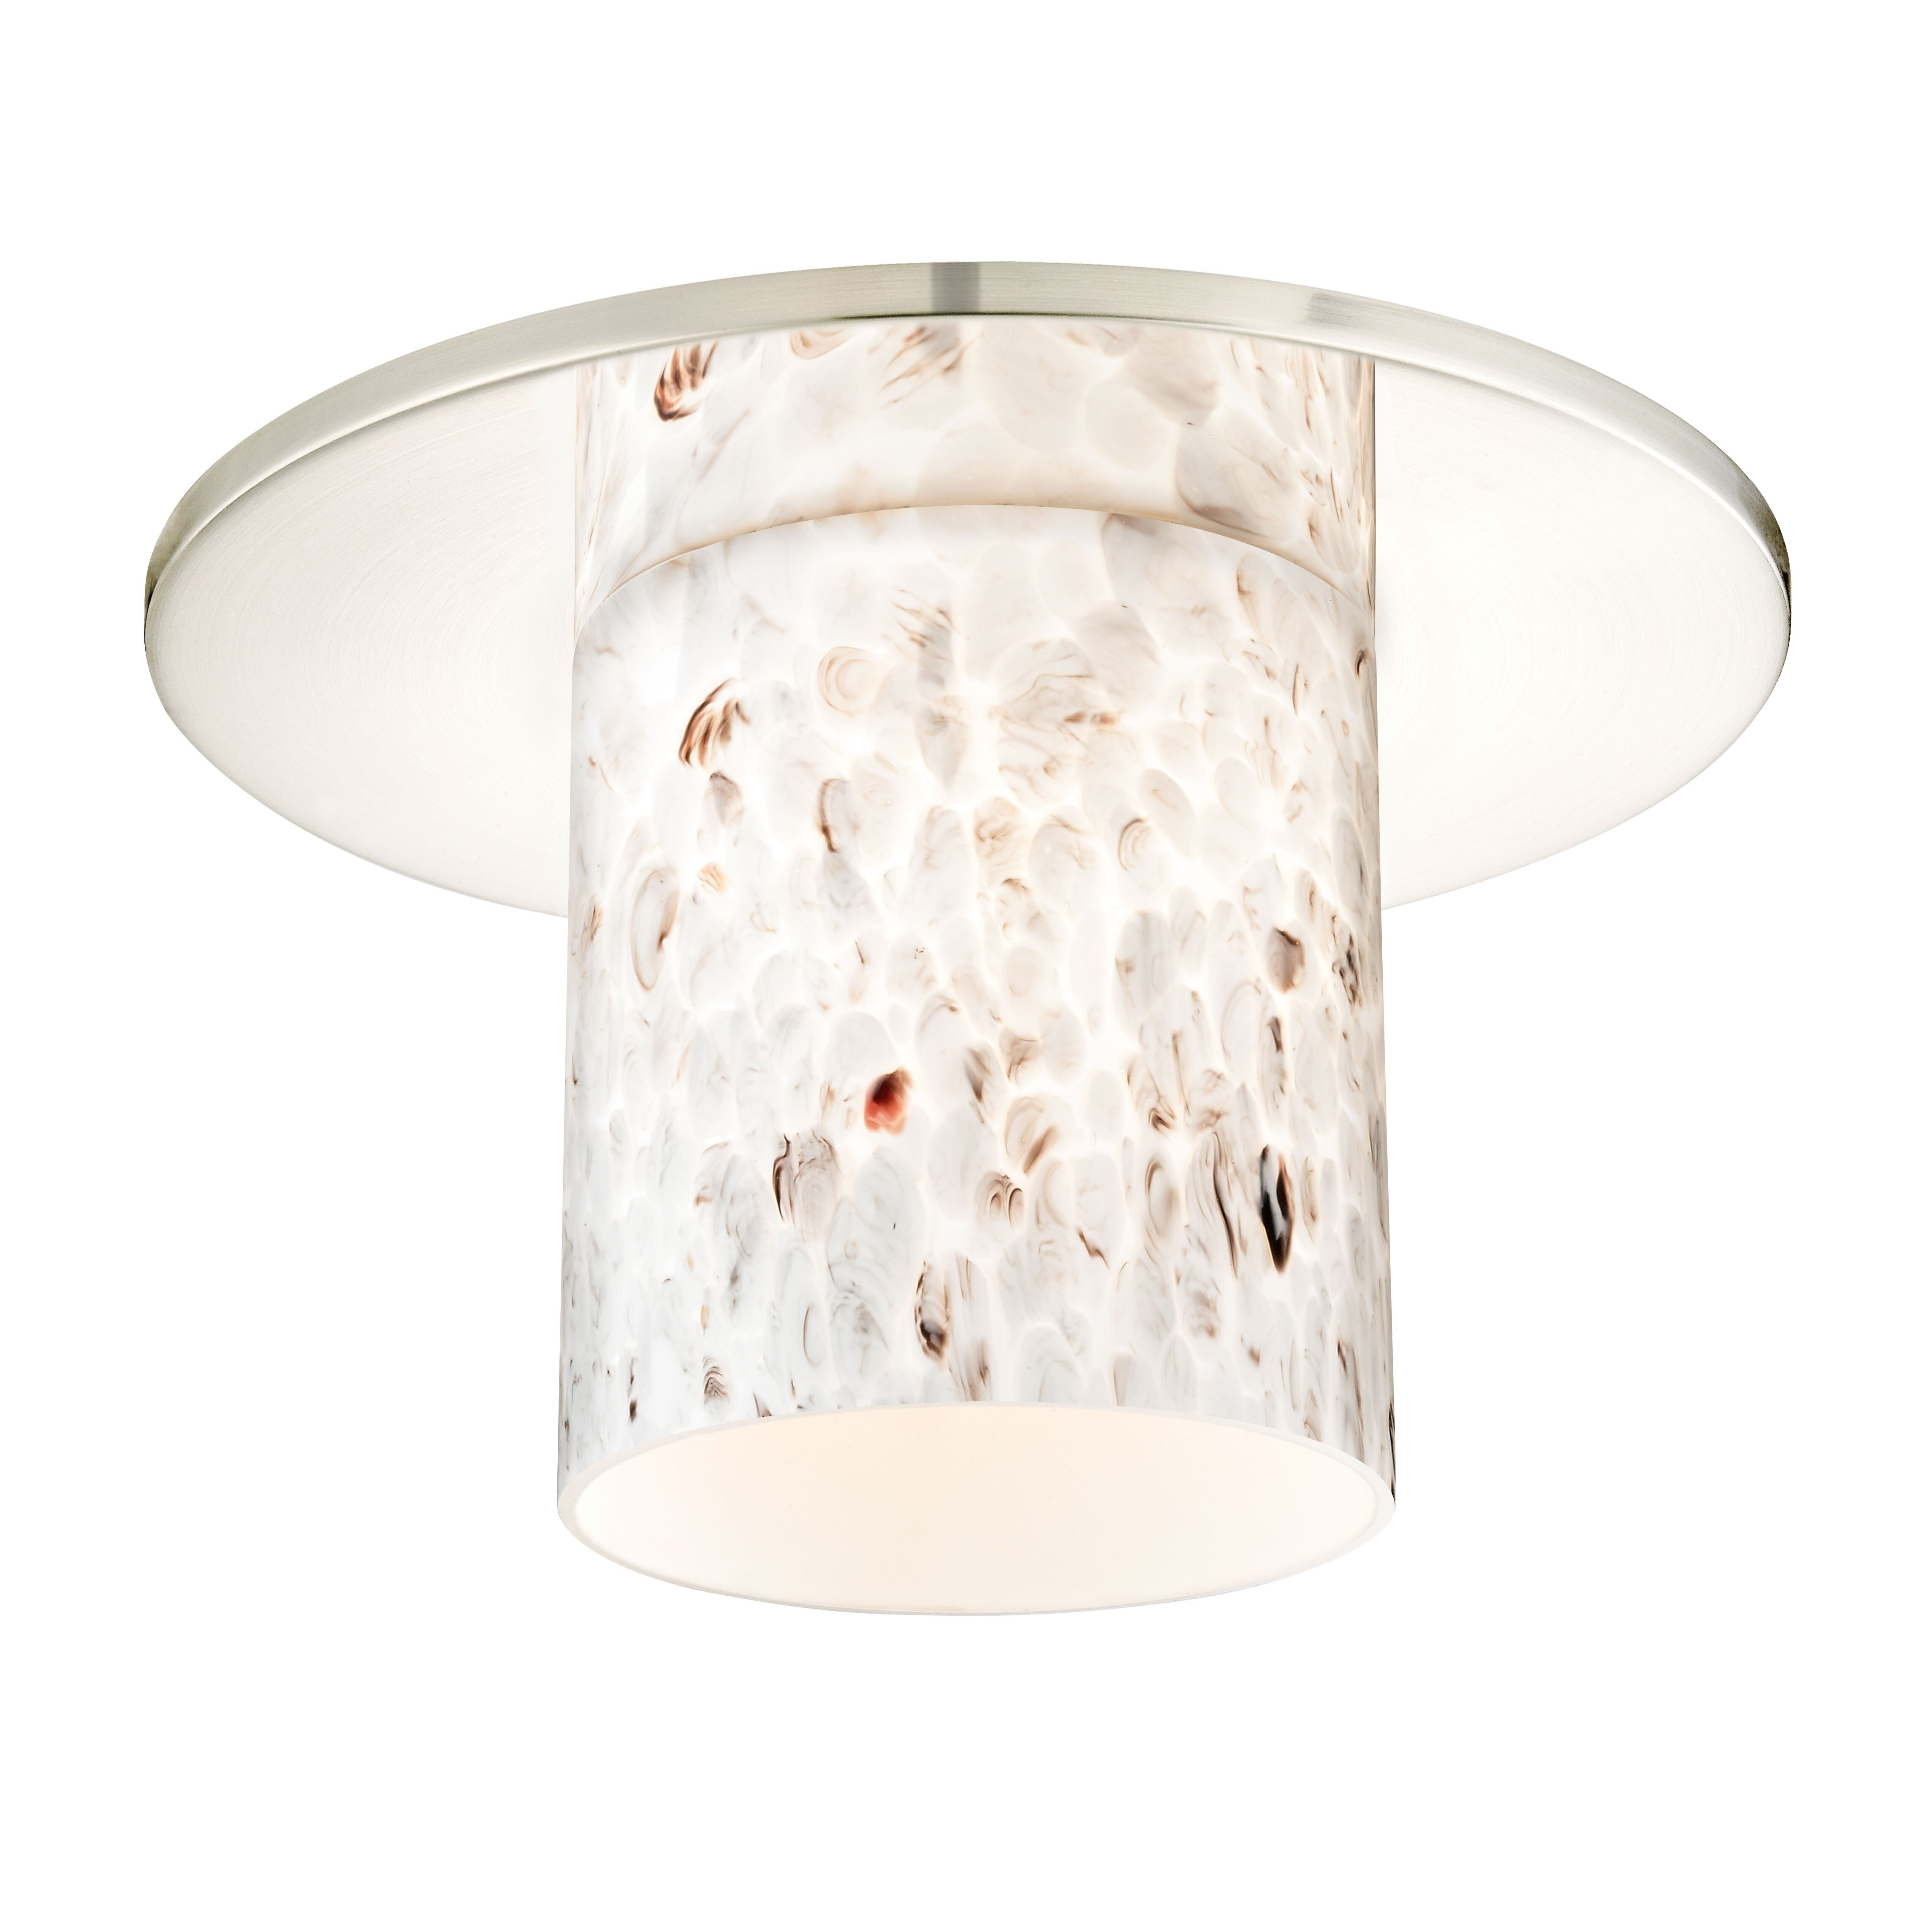 11 glass drum lamp shade wayfair. Black Bedroom Furniture Sets. Home Design Ideas